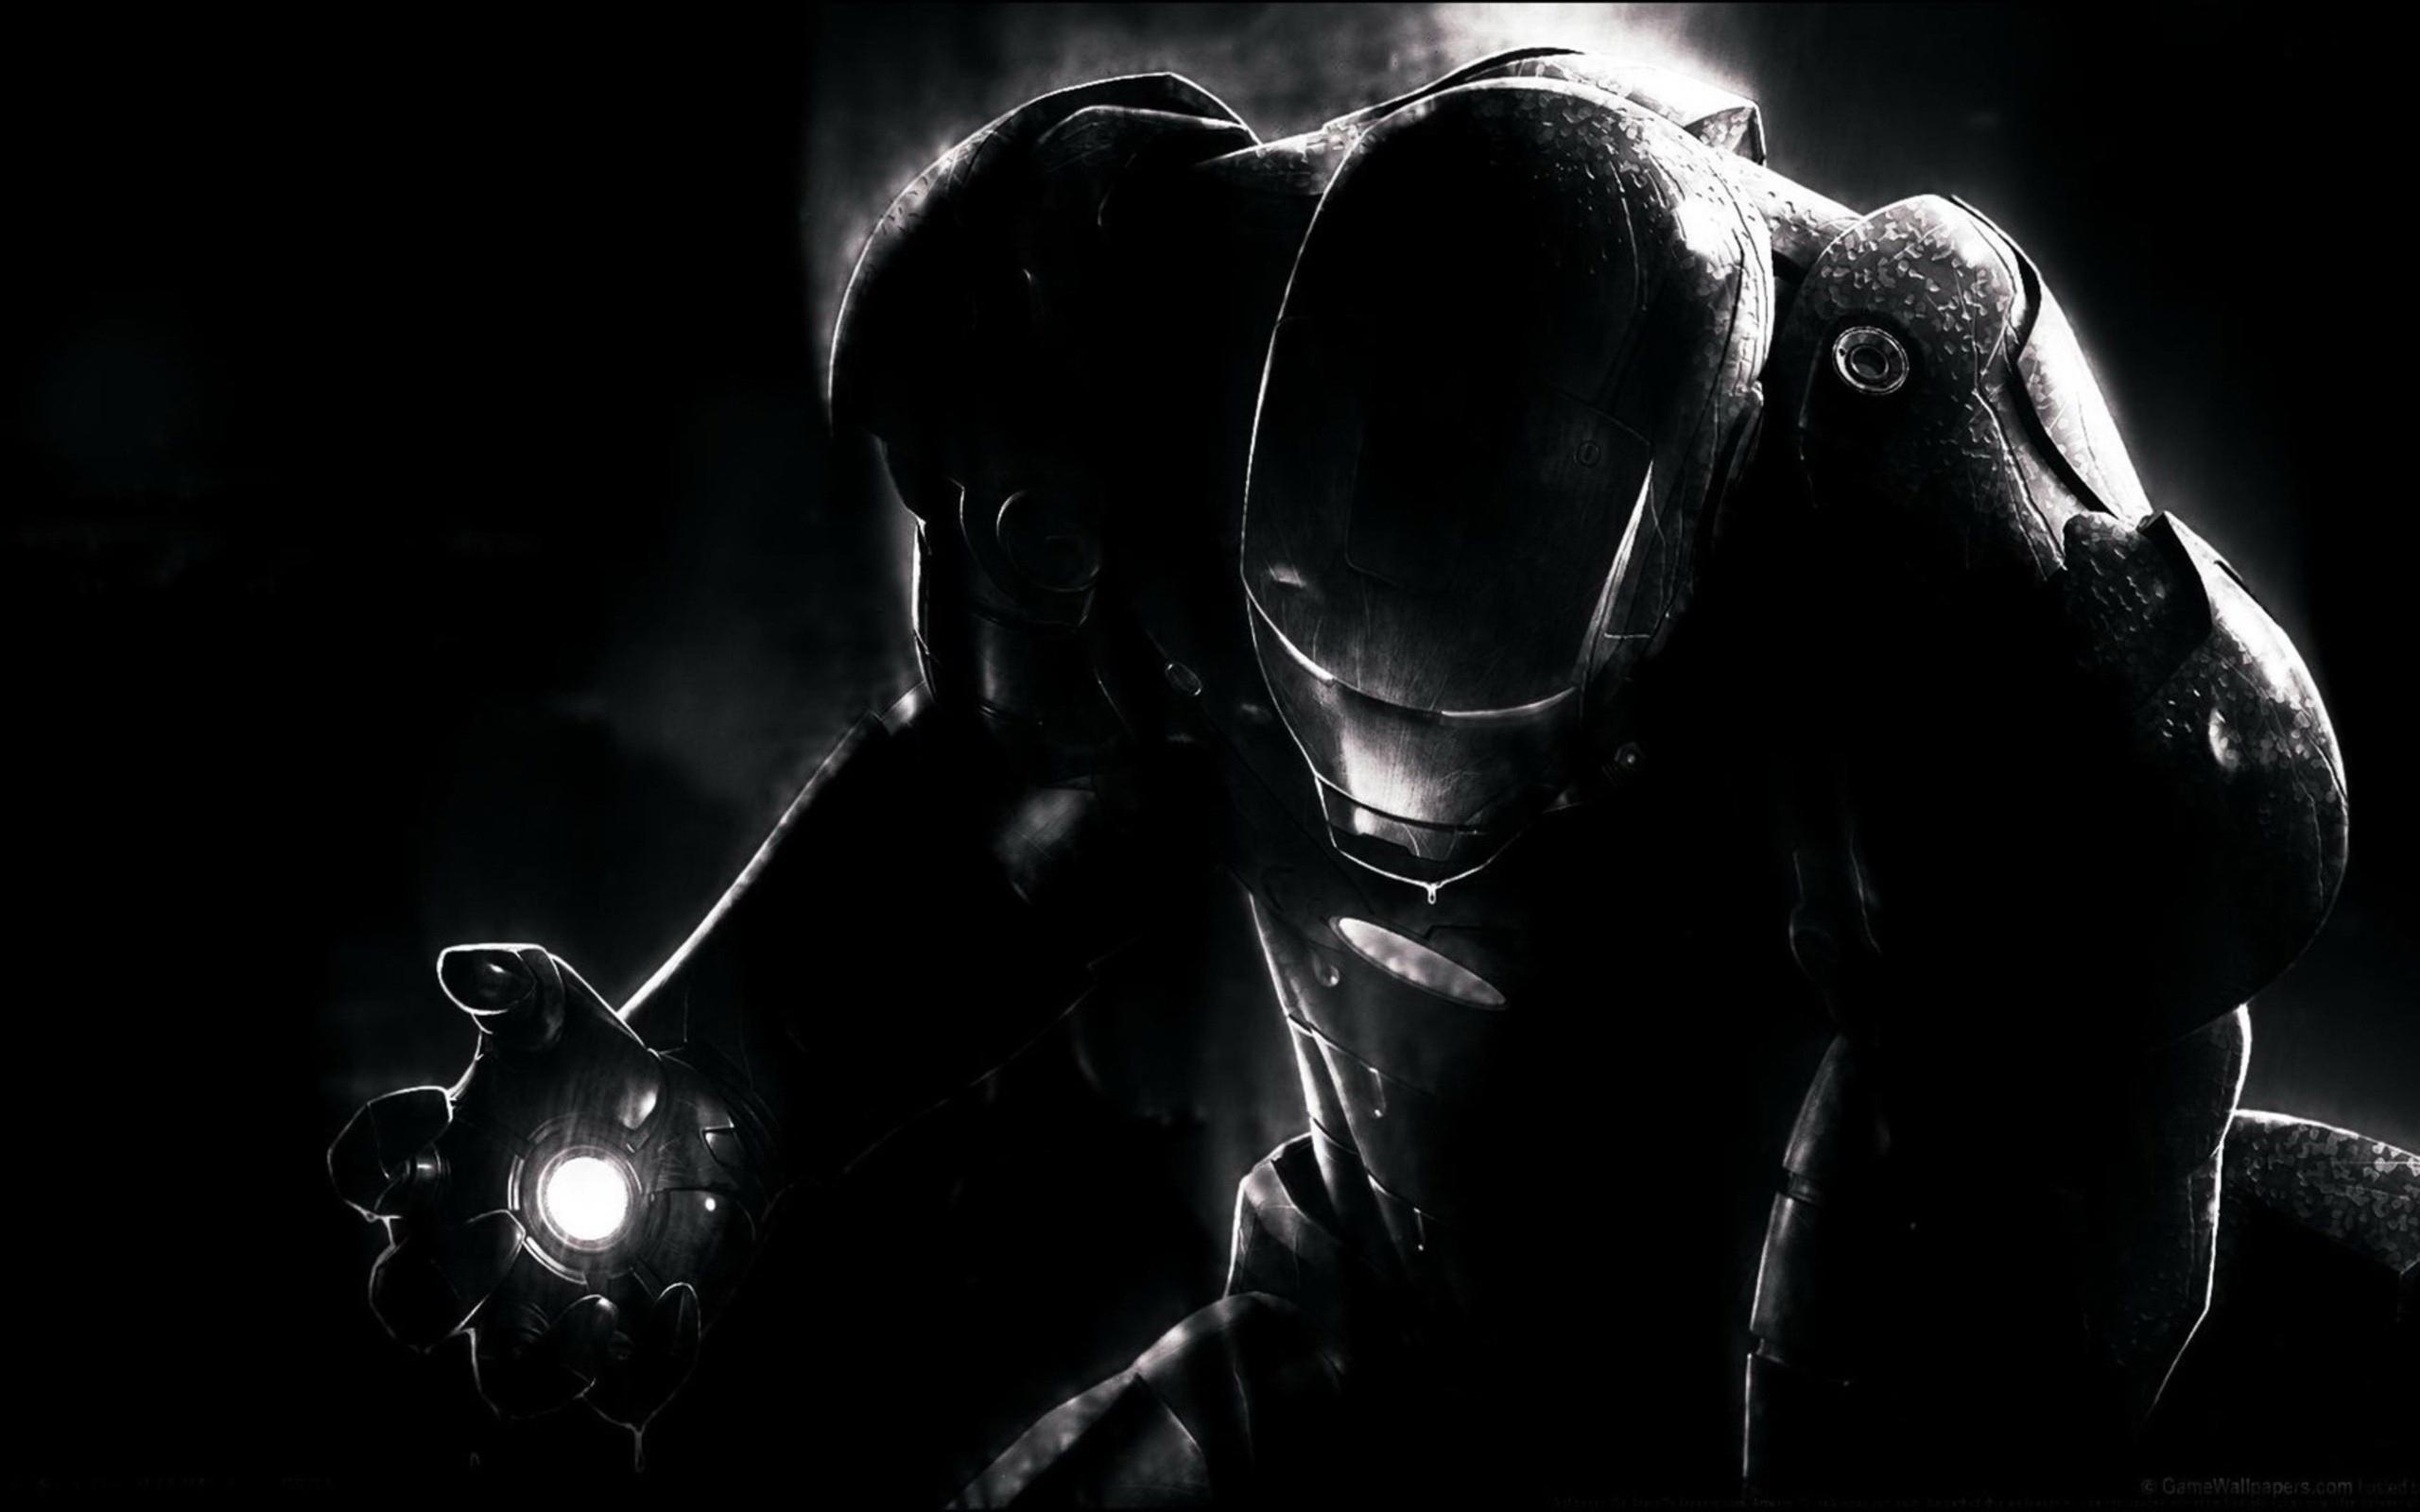 iron man hd wallpaper for windows phone | animaxwallpaper